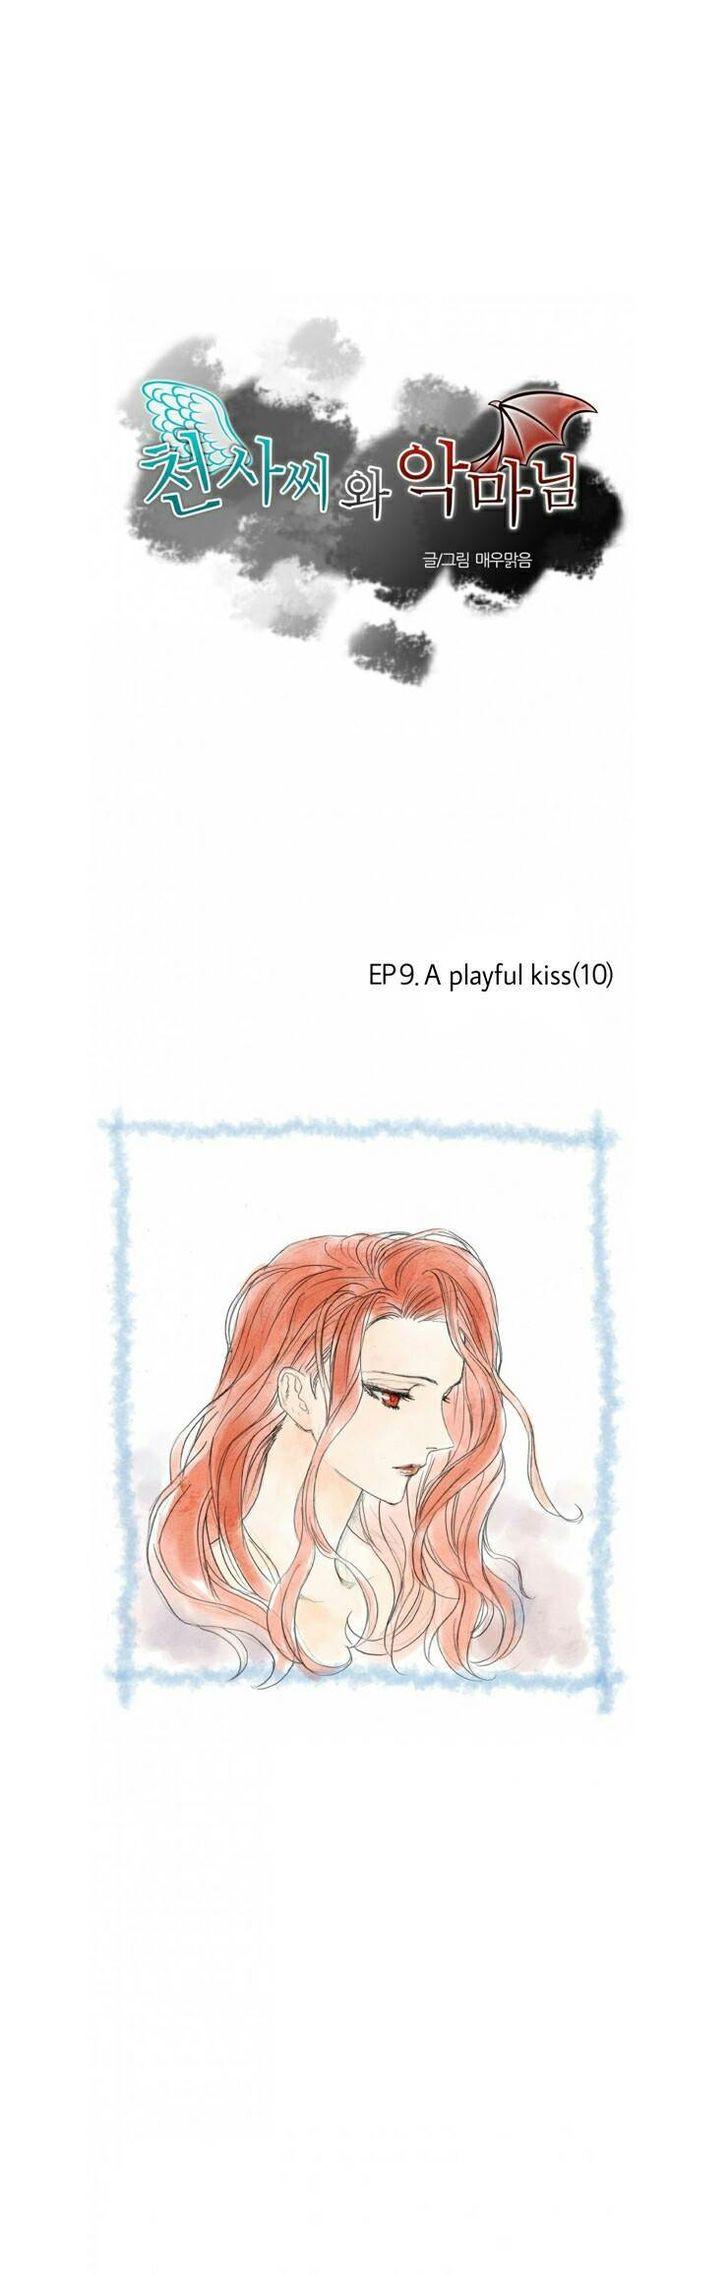 https://im.nineanime.com/comics/pic9/58/23610/513865/MissAngelandMissDevil360575.jpg Page 1